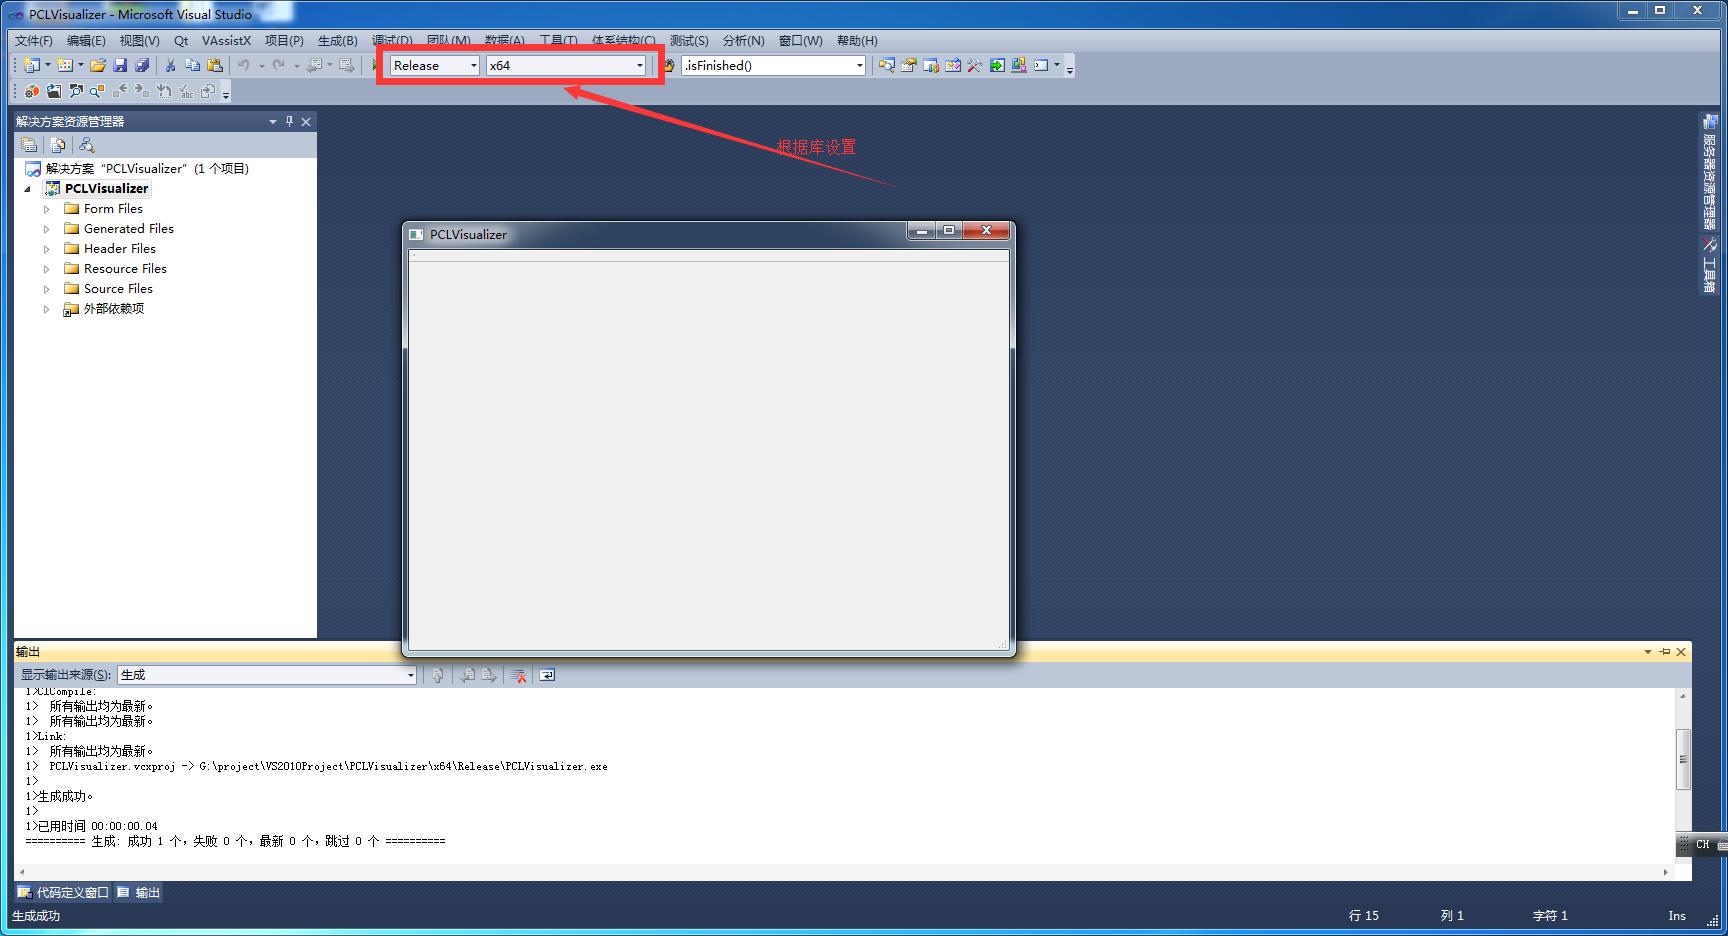 PCL+QT+VS Display Point Cloud